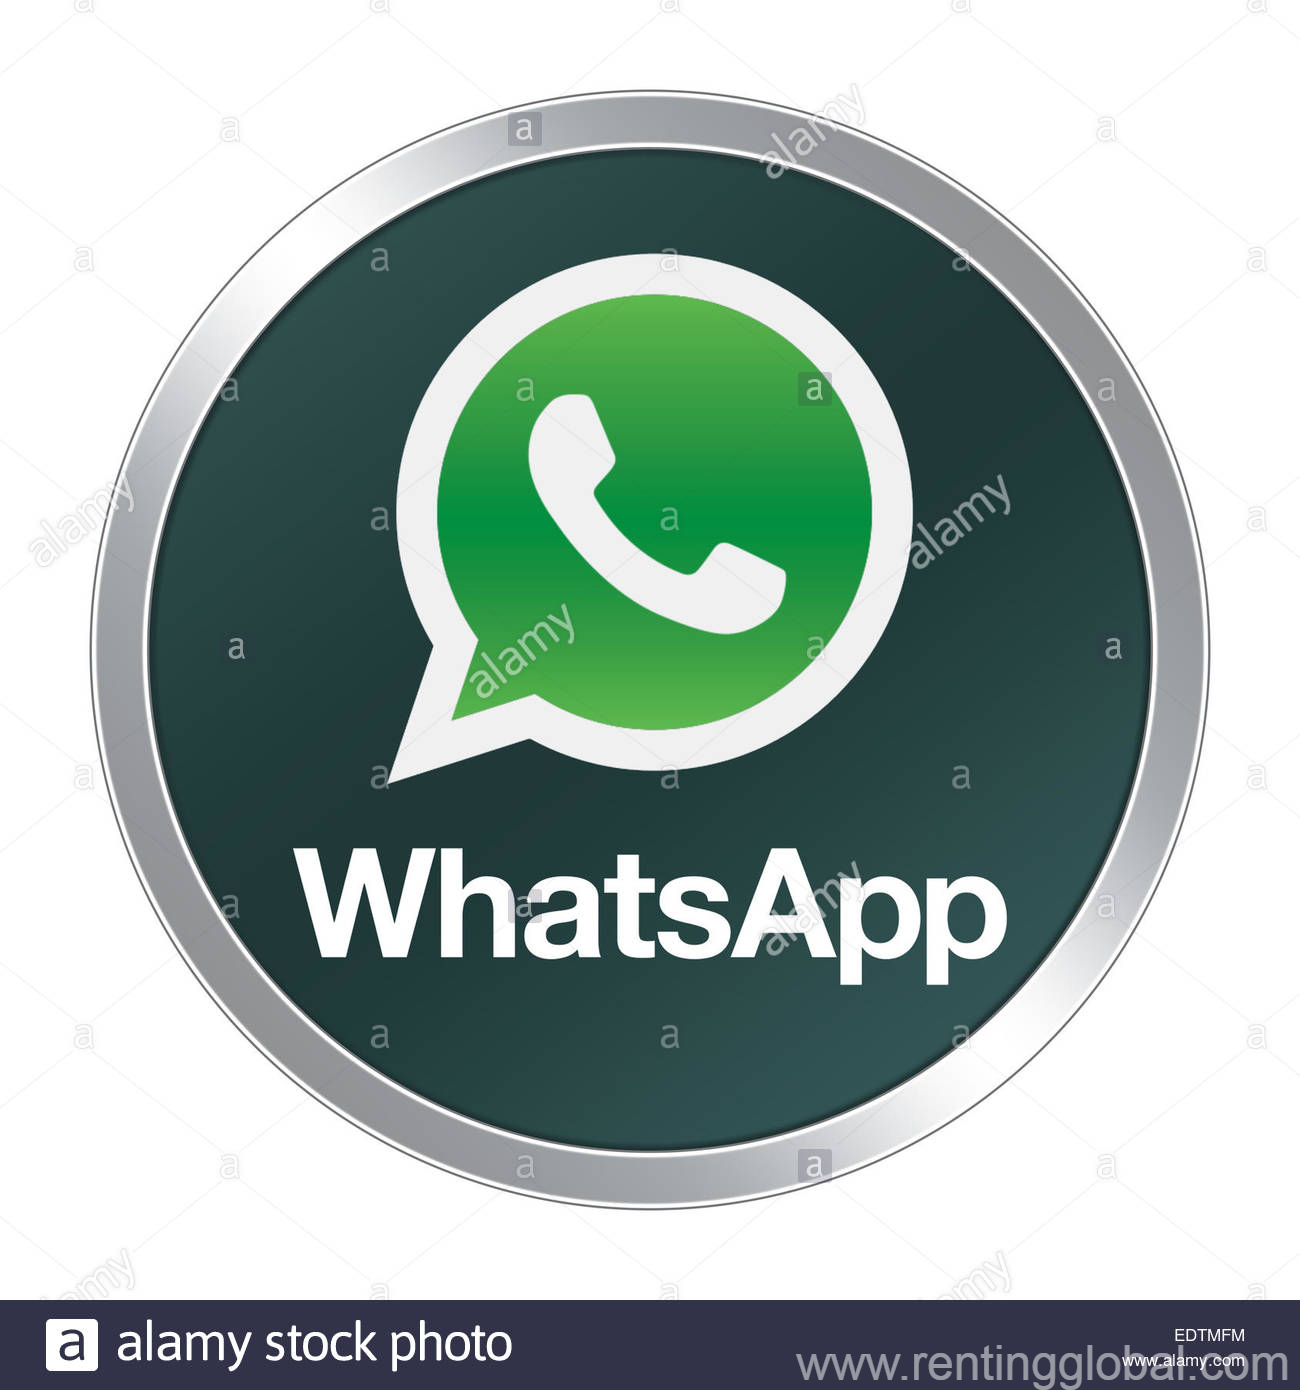 www.rentingglobal.com, renting, global, Delhi Cantonment, New Delhi, Delhi, India, Bulk Whatsapp service for Software in Mumbai, Delhi